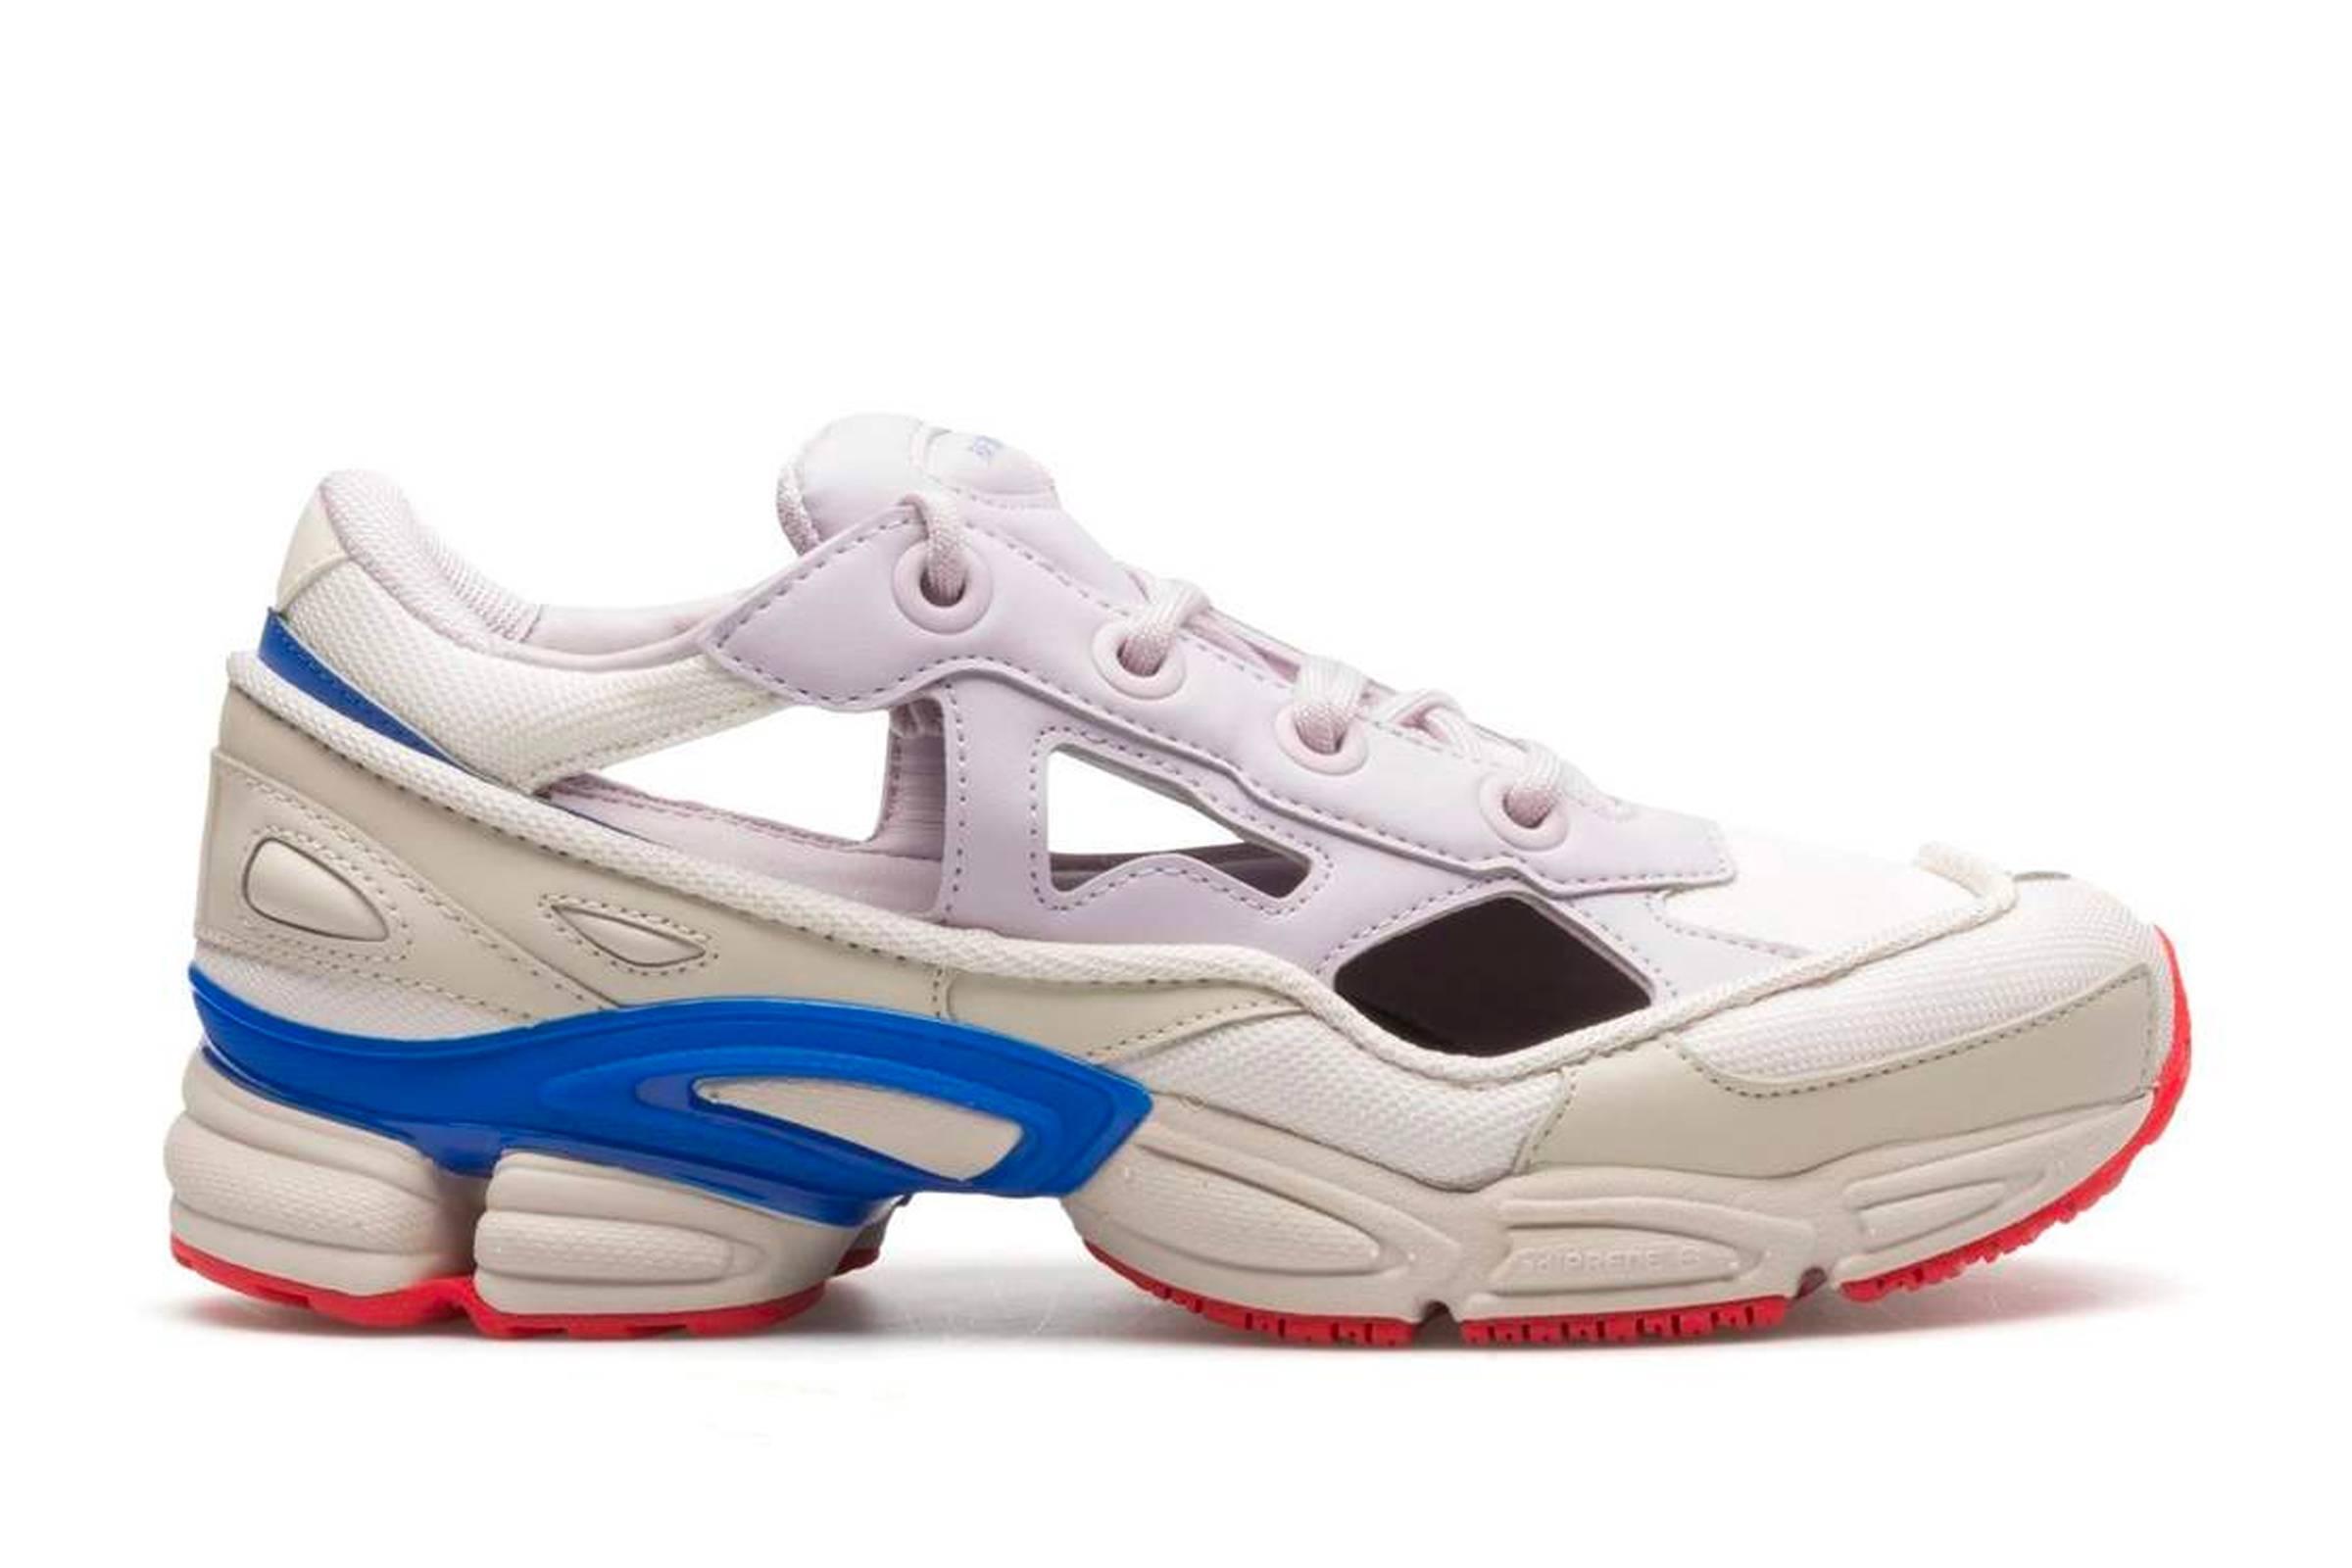 Raf Simons x adidas Replicant Ozweego Independence Day